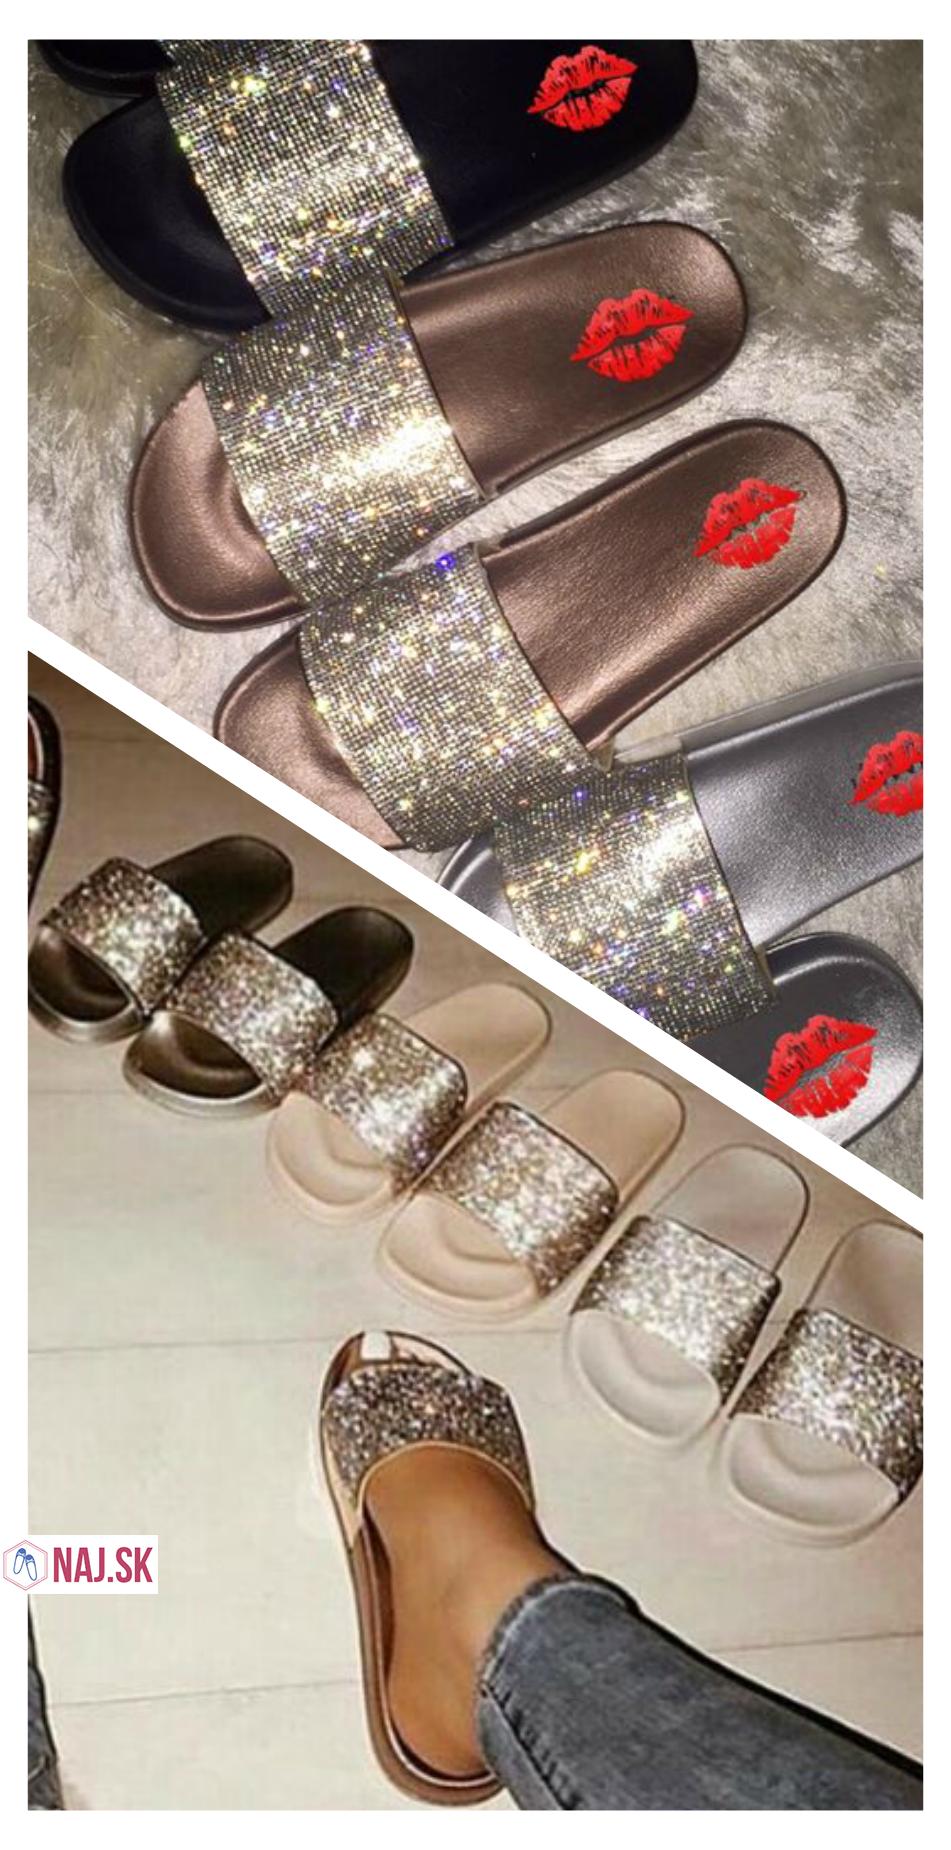 cfb661b8fdf7f trblietavé papuče, šľapky, slippers, ružové papuče na doma, strieborné  papuče, čierne papuče, papučky, naj.sk, topánky